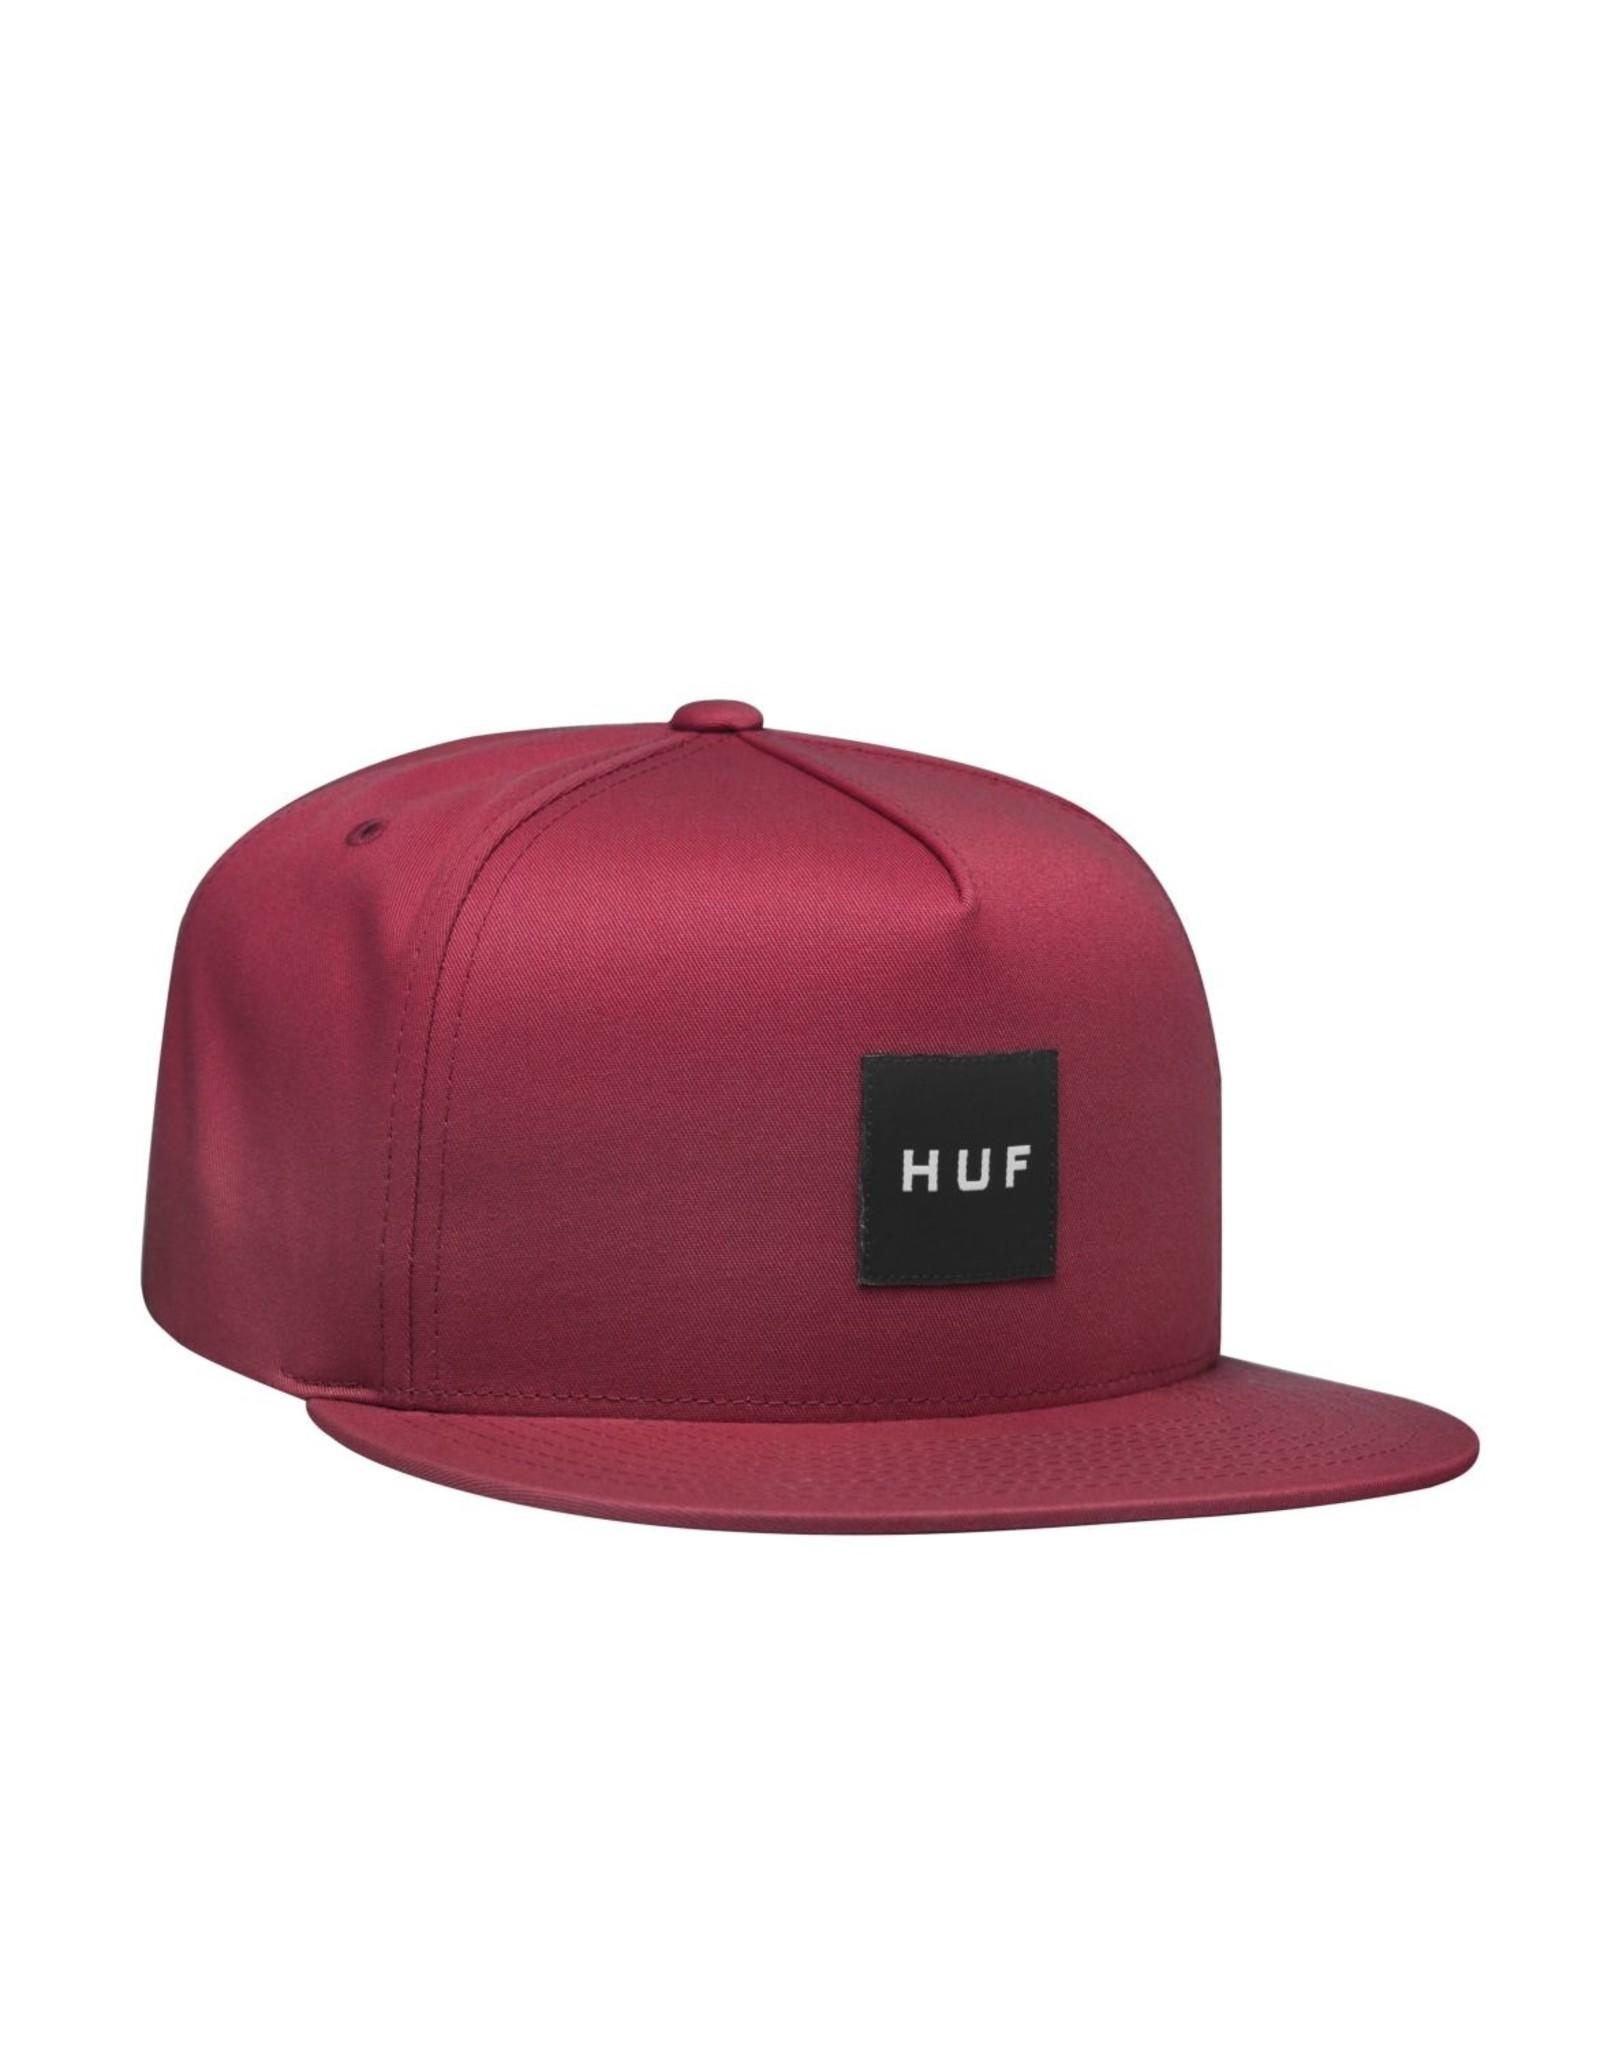 HUF Essentials Box Snapback Rose Wood Red Huf